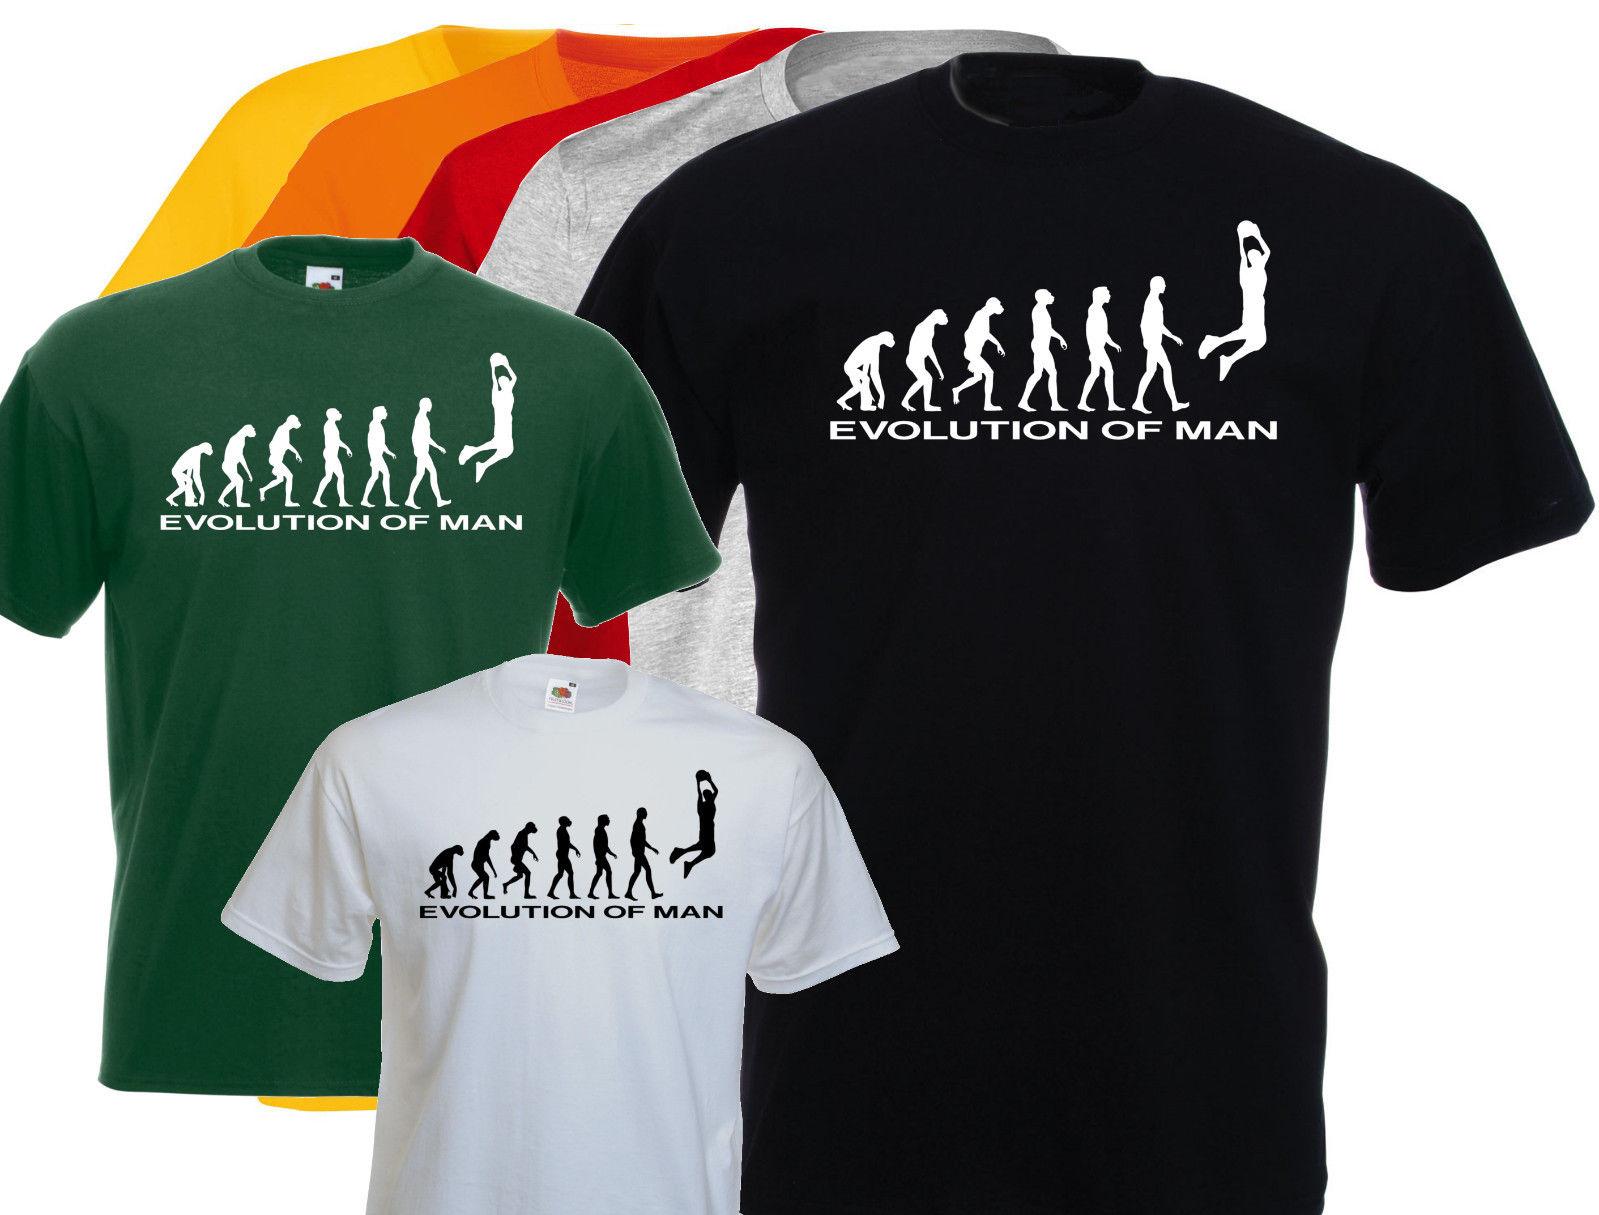 a7b3d1494c5f 2019 Men Hip Hop Fashion Casual Tee Shirt for Men T-Shirt Homme Evolution  of Man.. Basket Ball, Sporter Custom Made T Shirts